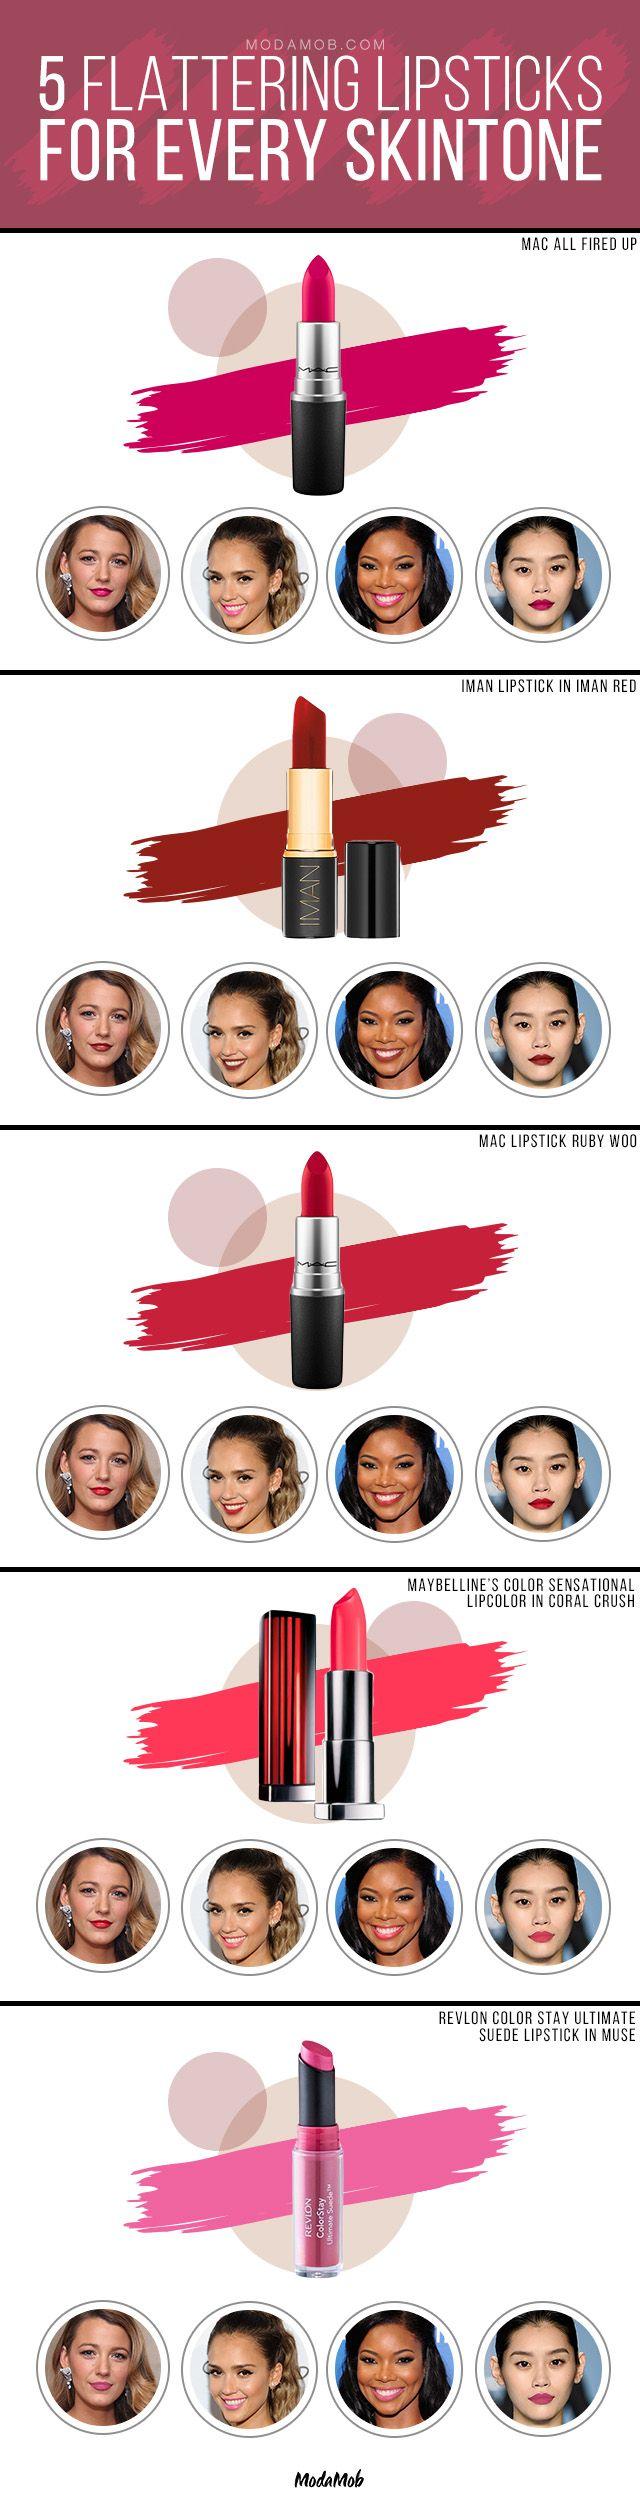 5 Flattering Lipsticks That Work For Every Skin Tone | Obsev